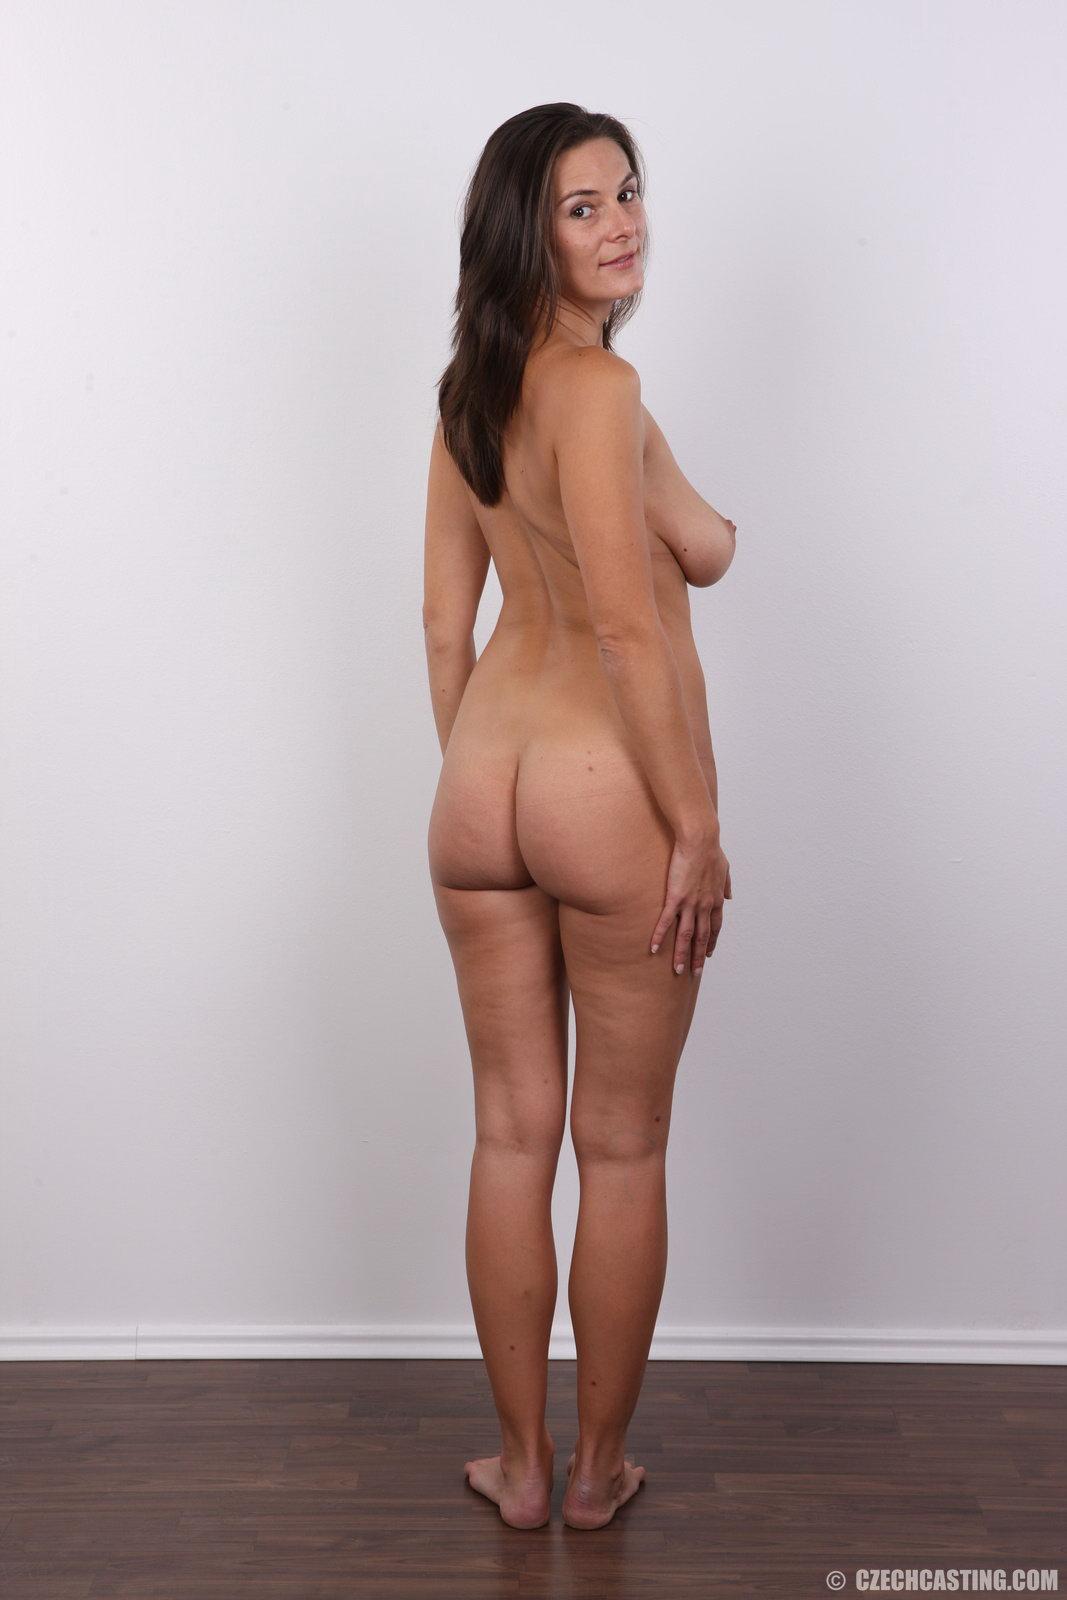 Alnna Porn mature czech alena porn image 4 fap | free hot nude porn pic